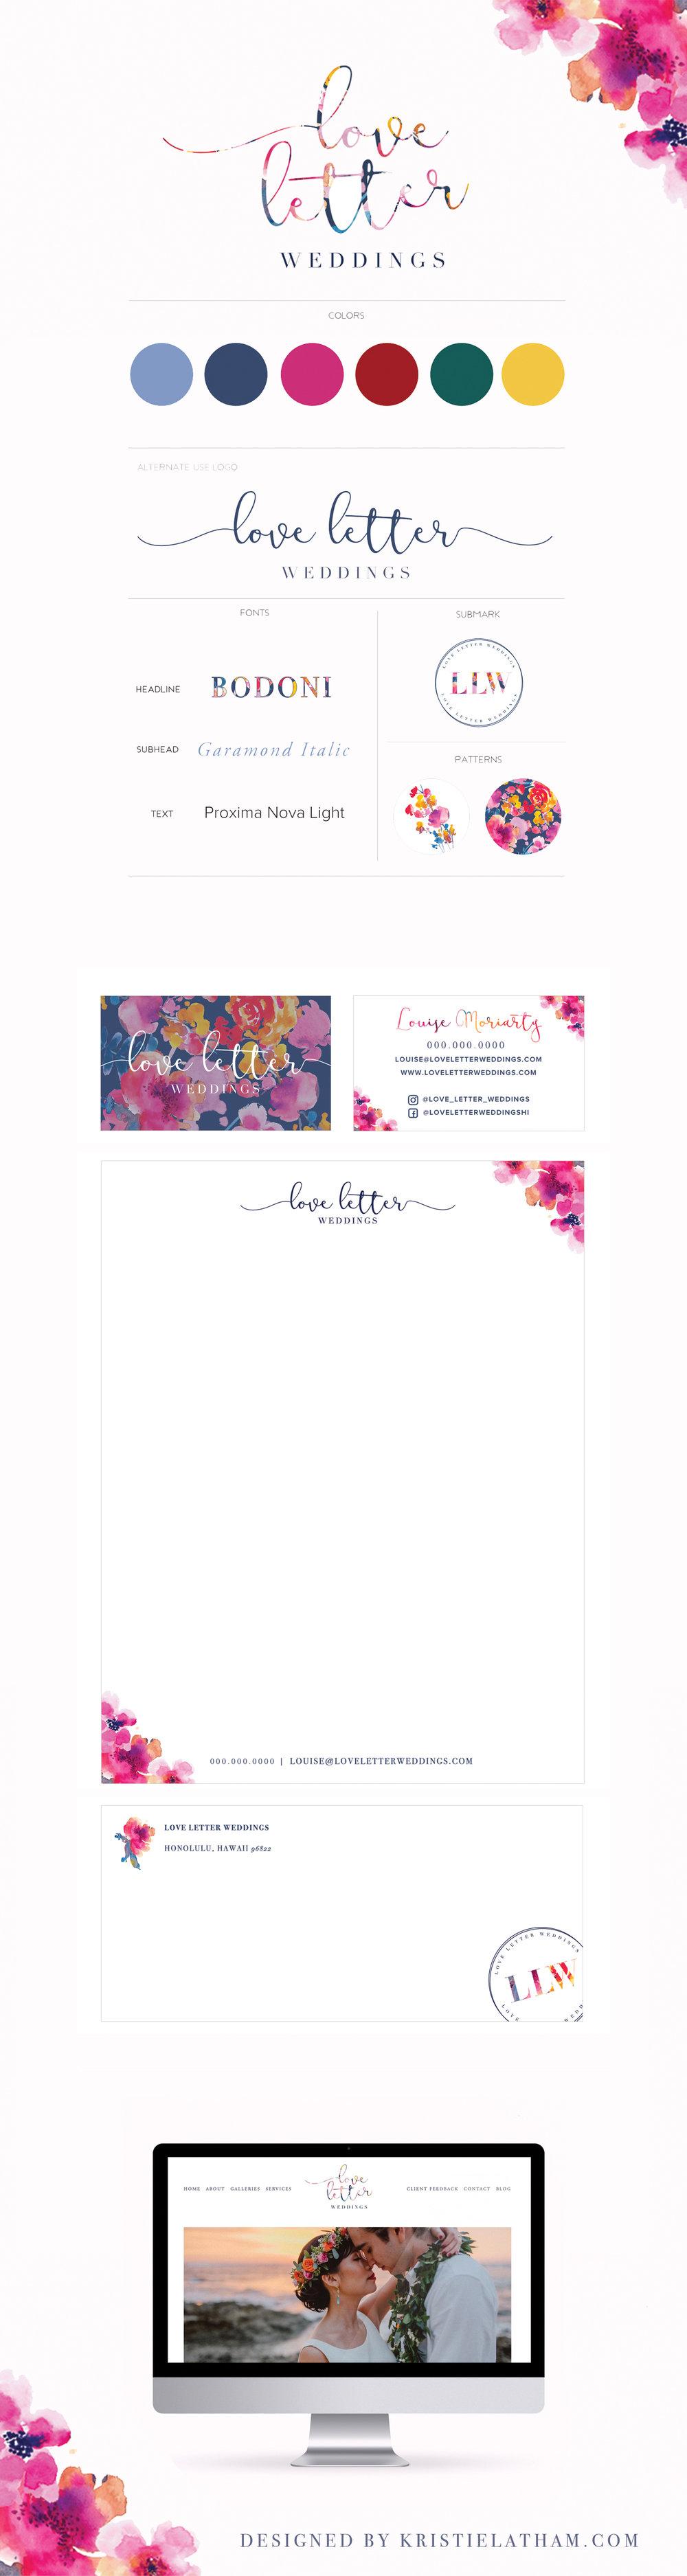 love-letter-weddings-by-kristielatham.com.jpg